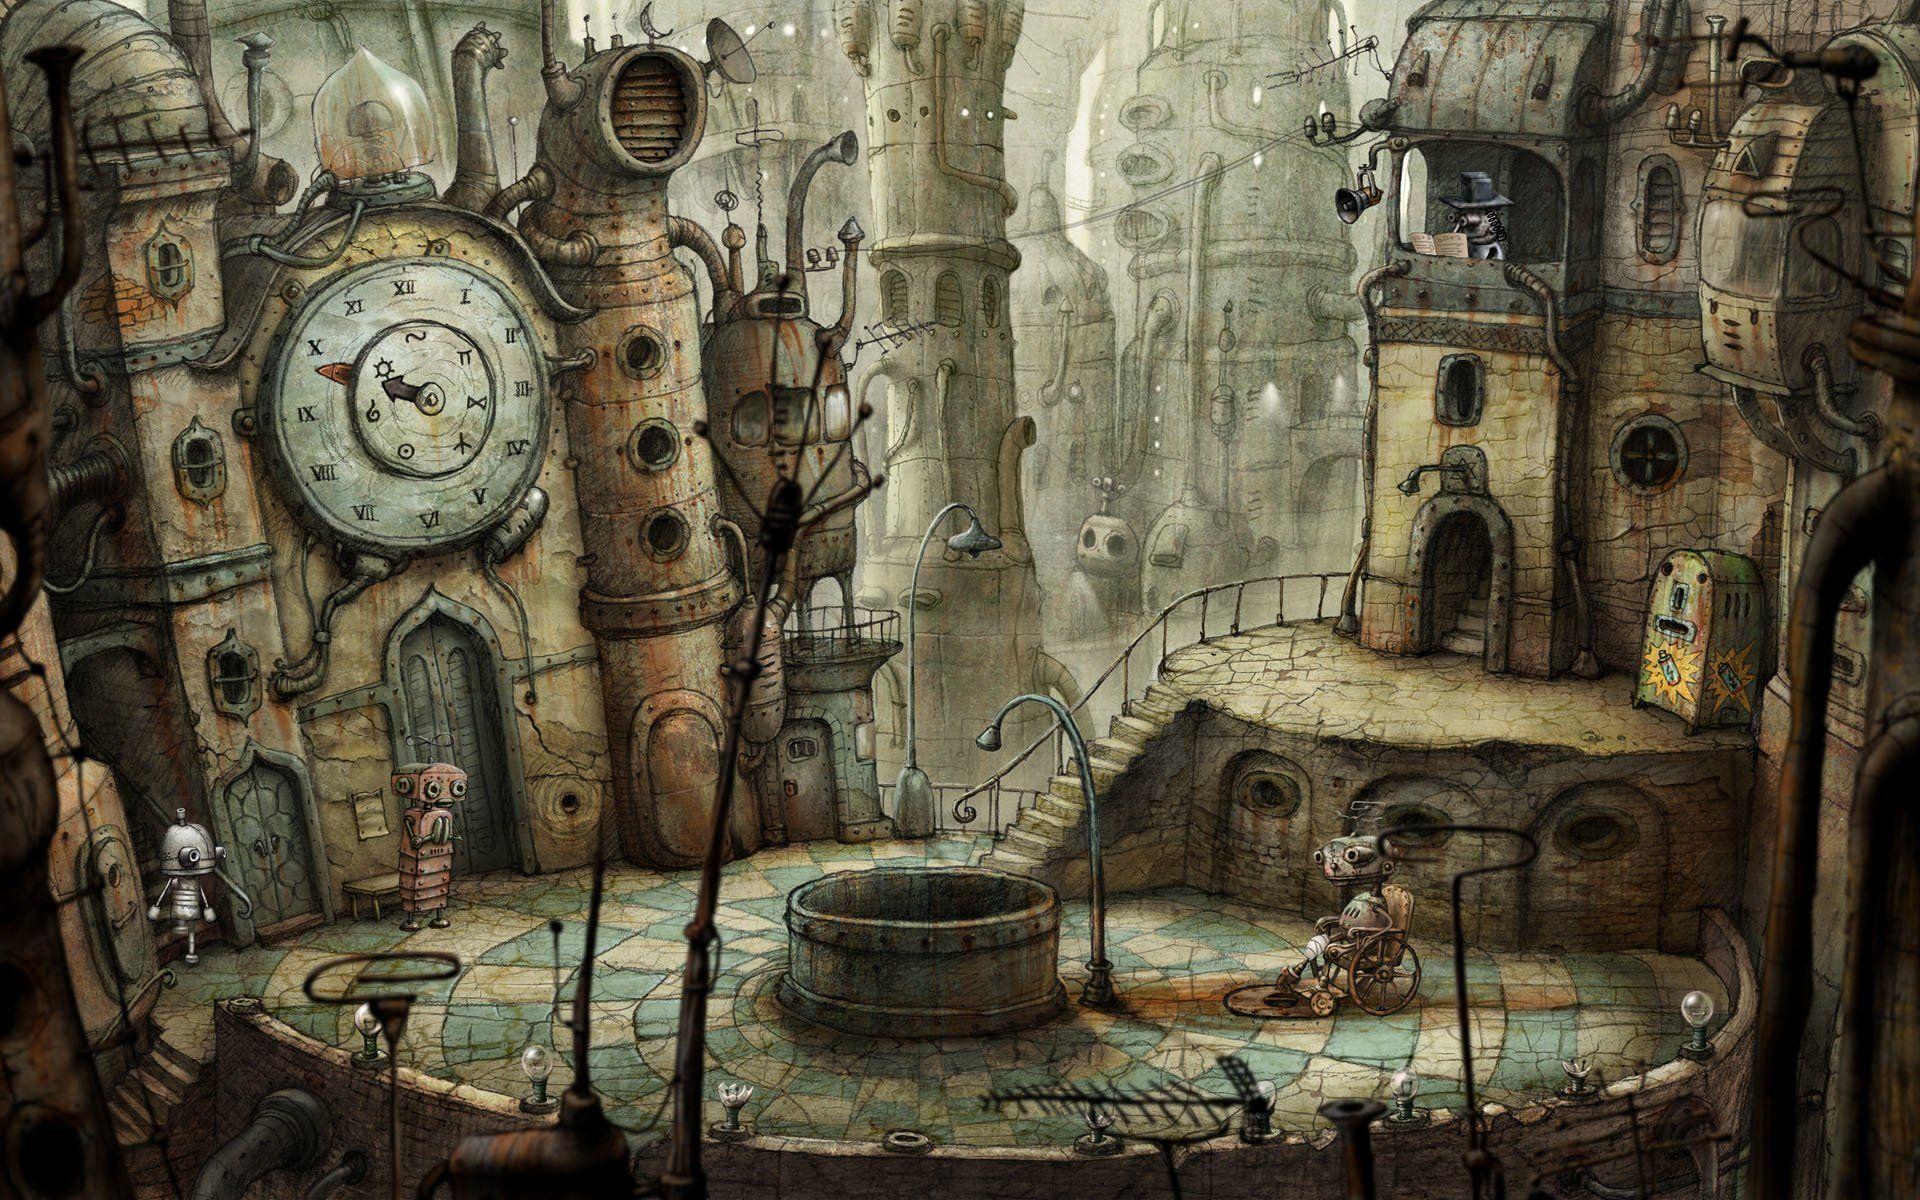 Video Game Machinarium Wallpaper Fond Ecran Paysage Ville Steampunk Art Steampunk